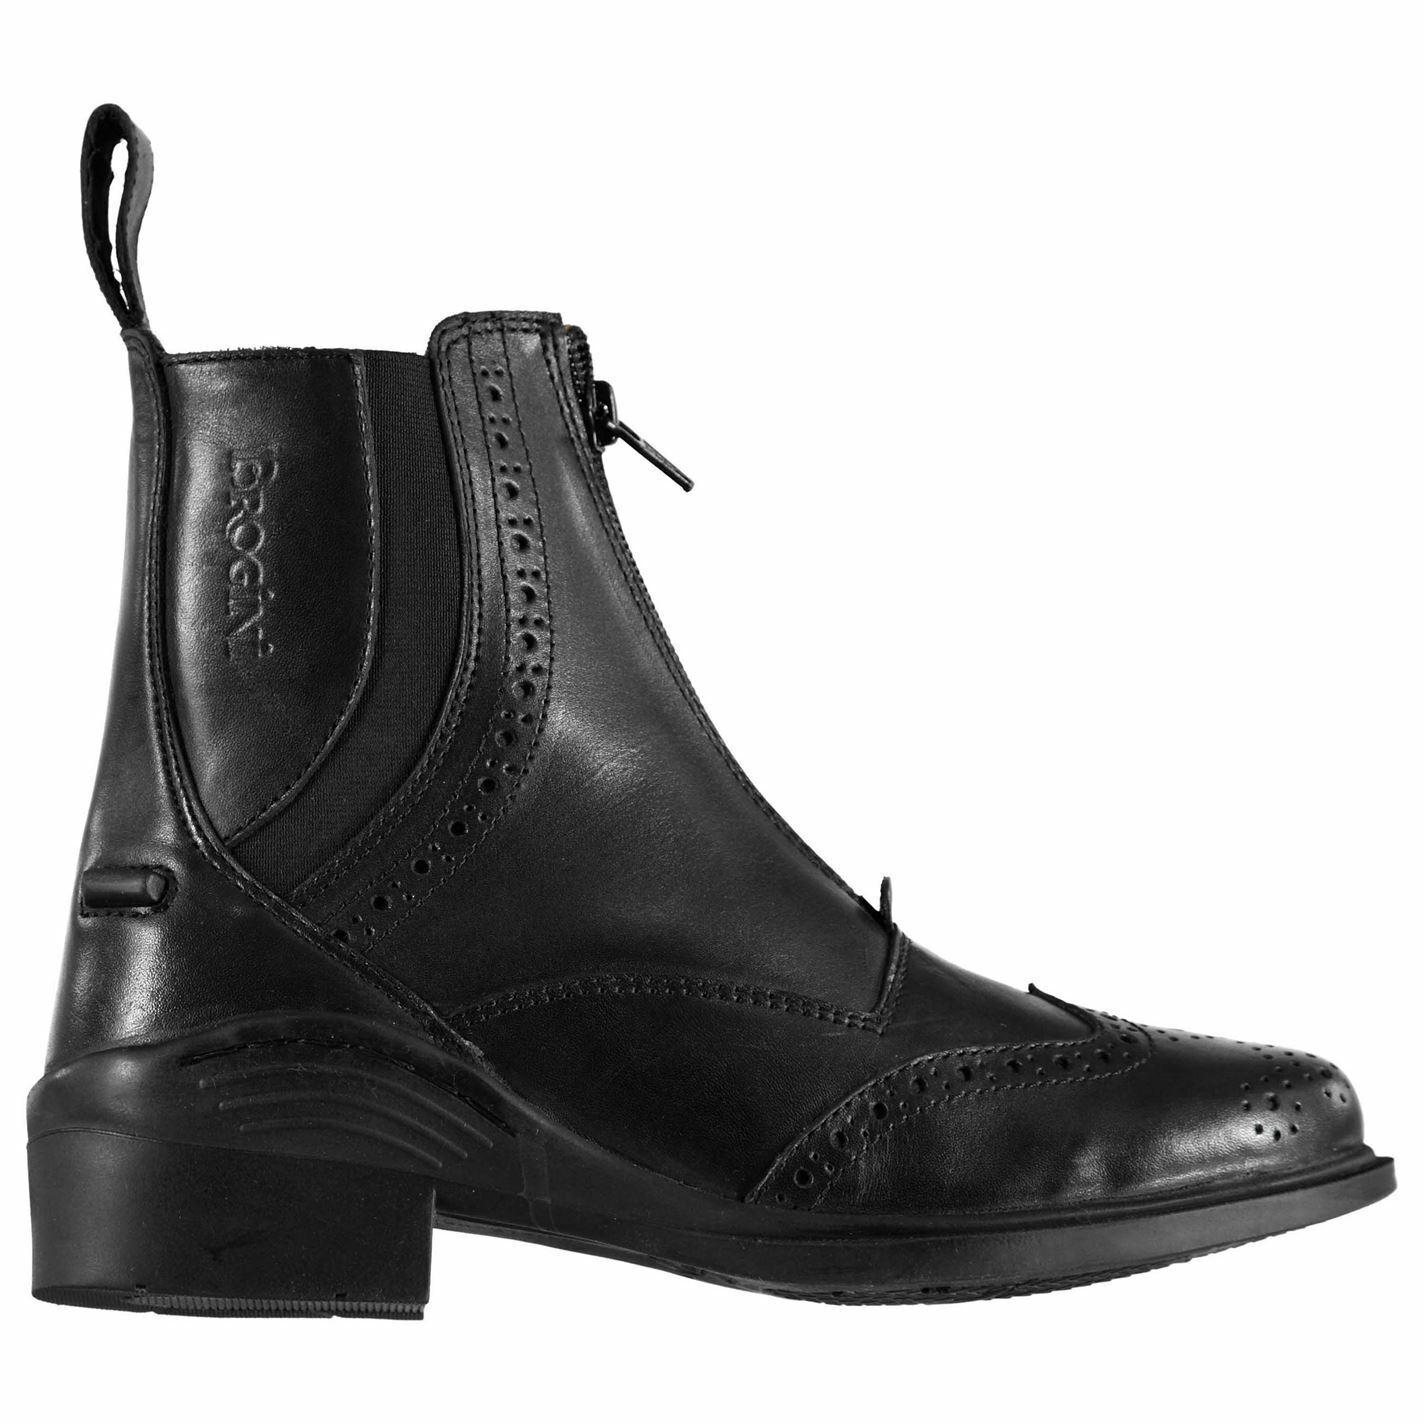 Brogini Womens Epsom Jodhpur Boots shoes Zip Equestrian Wingtip  Brogue Elastic  support wholesale retail